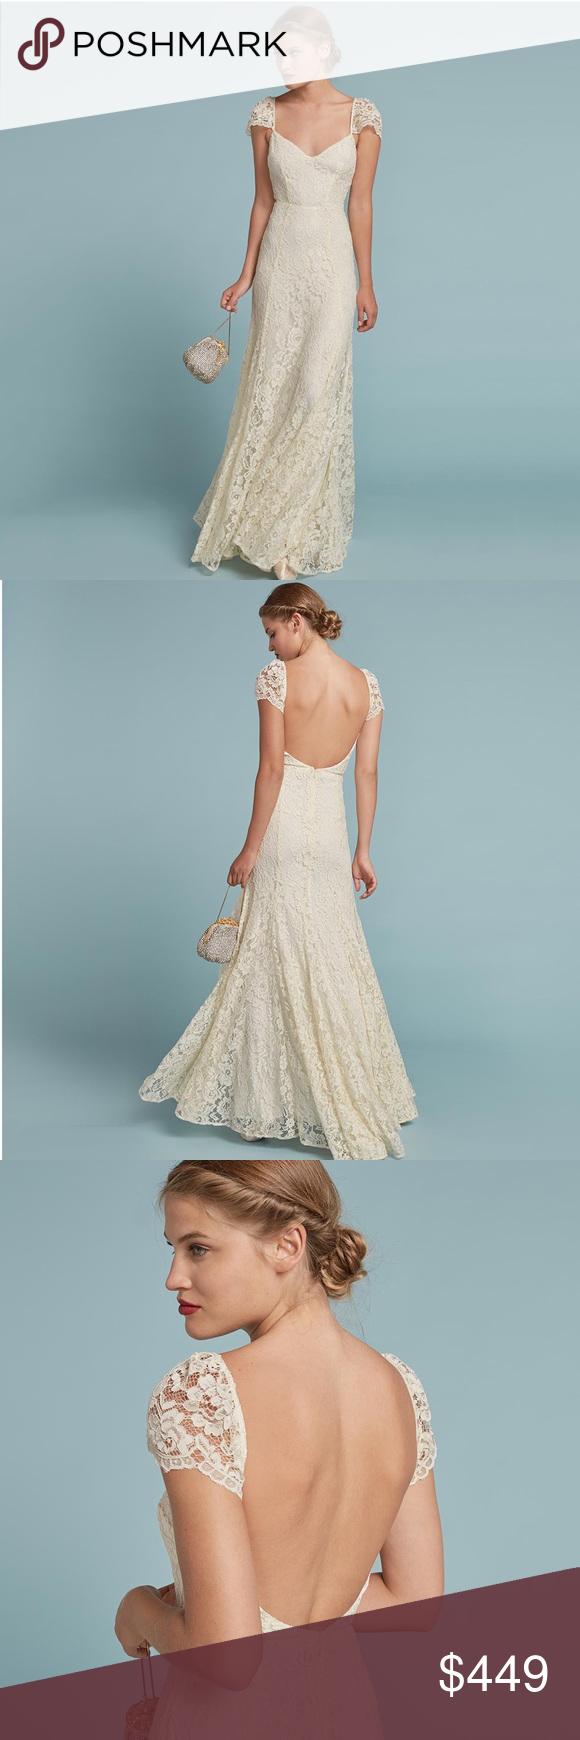 New reformation seleste consuelo wedding dress boutique party